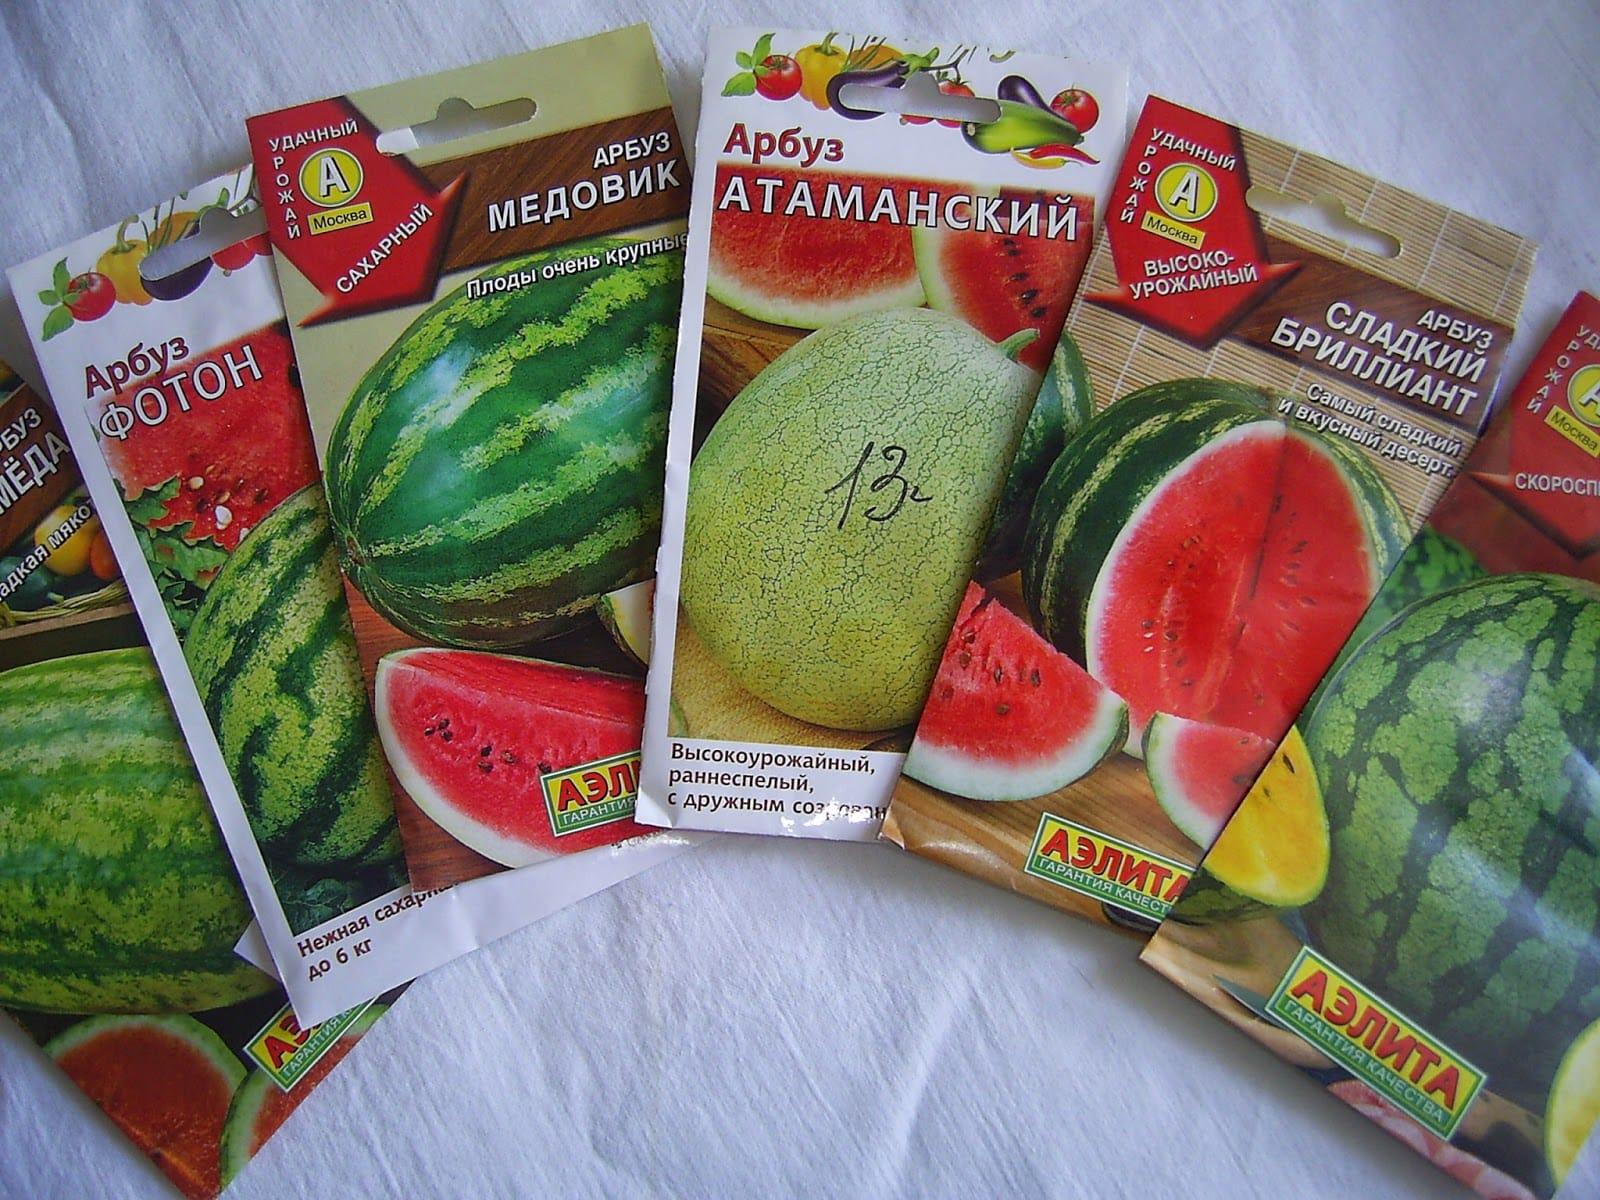 Сорта арбуза